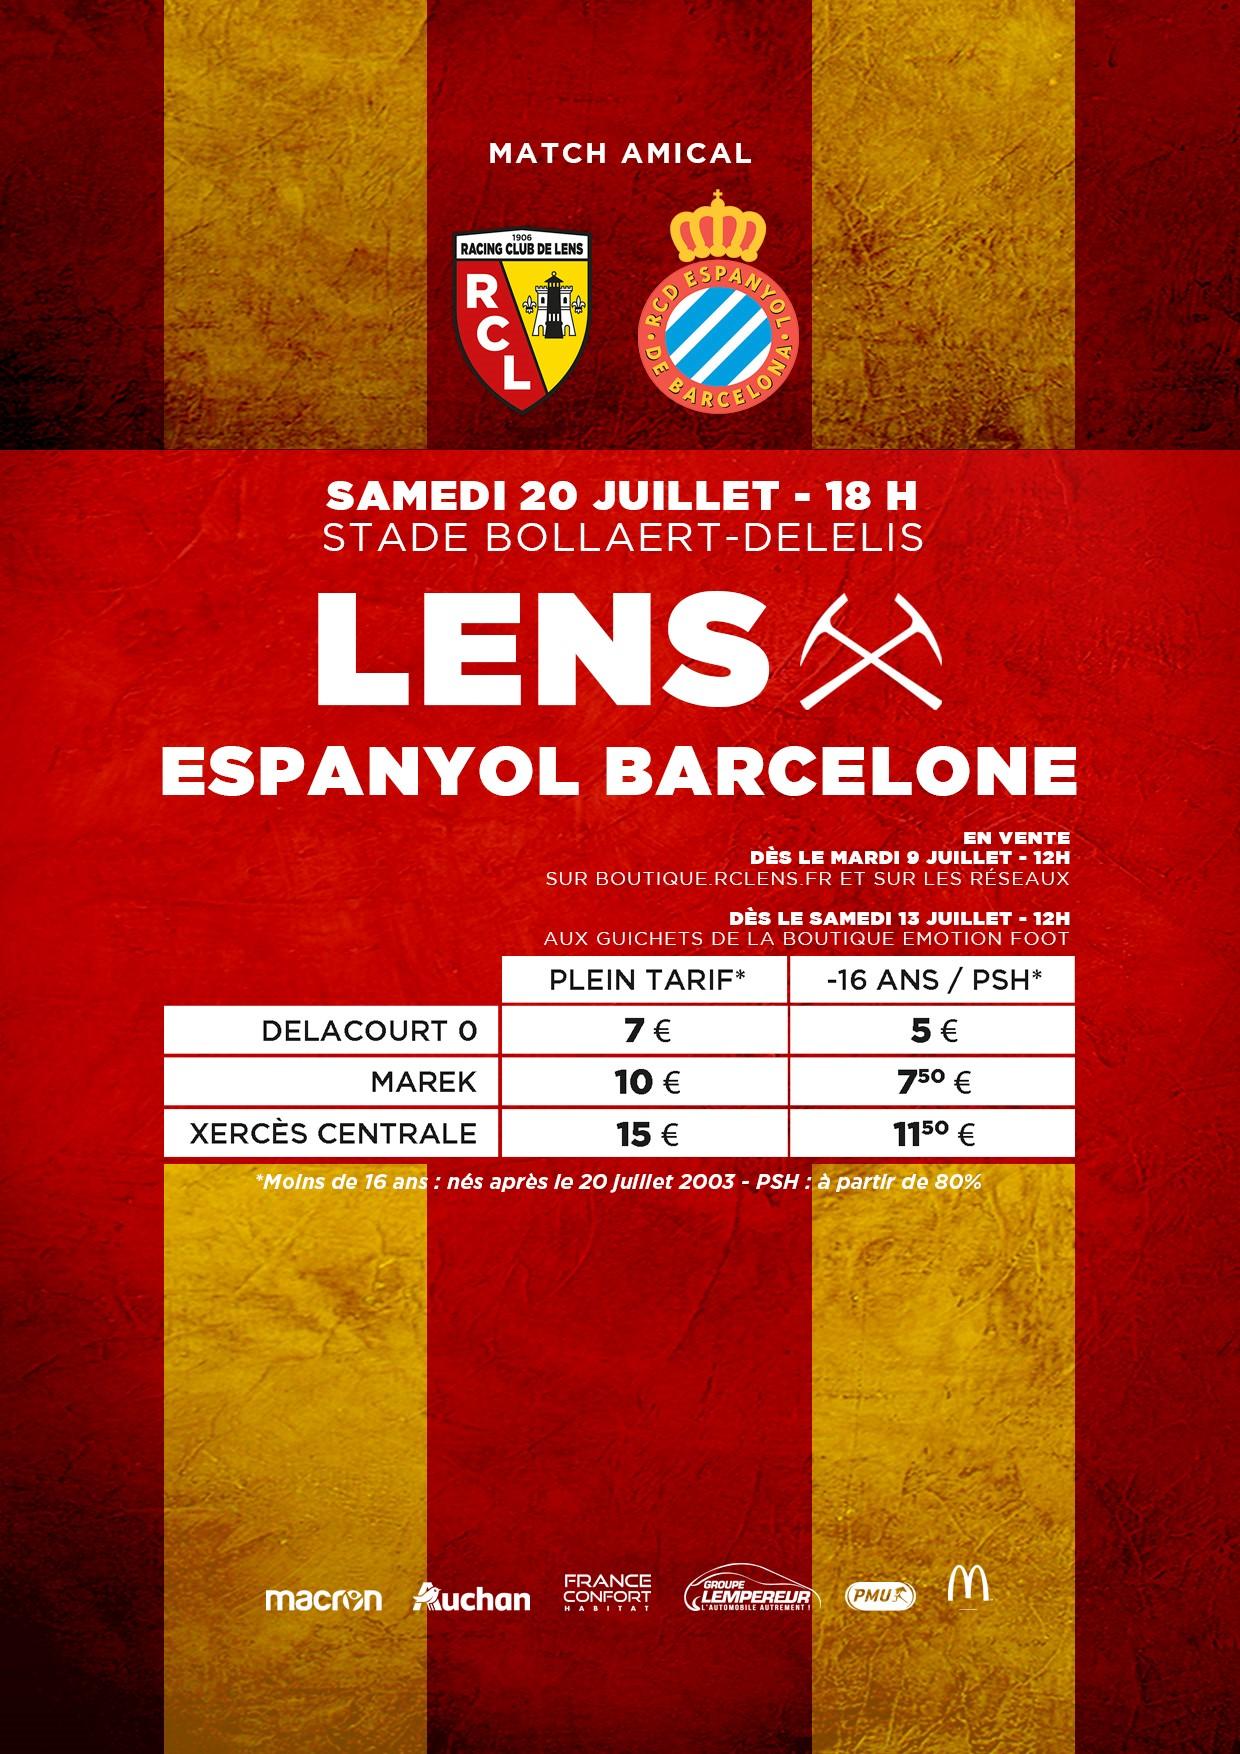 Lens - Espanyol Barcelone tarifs billetterie rclens